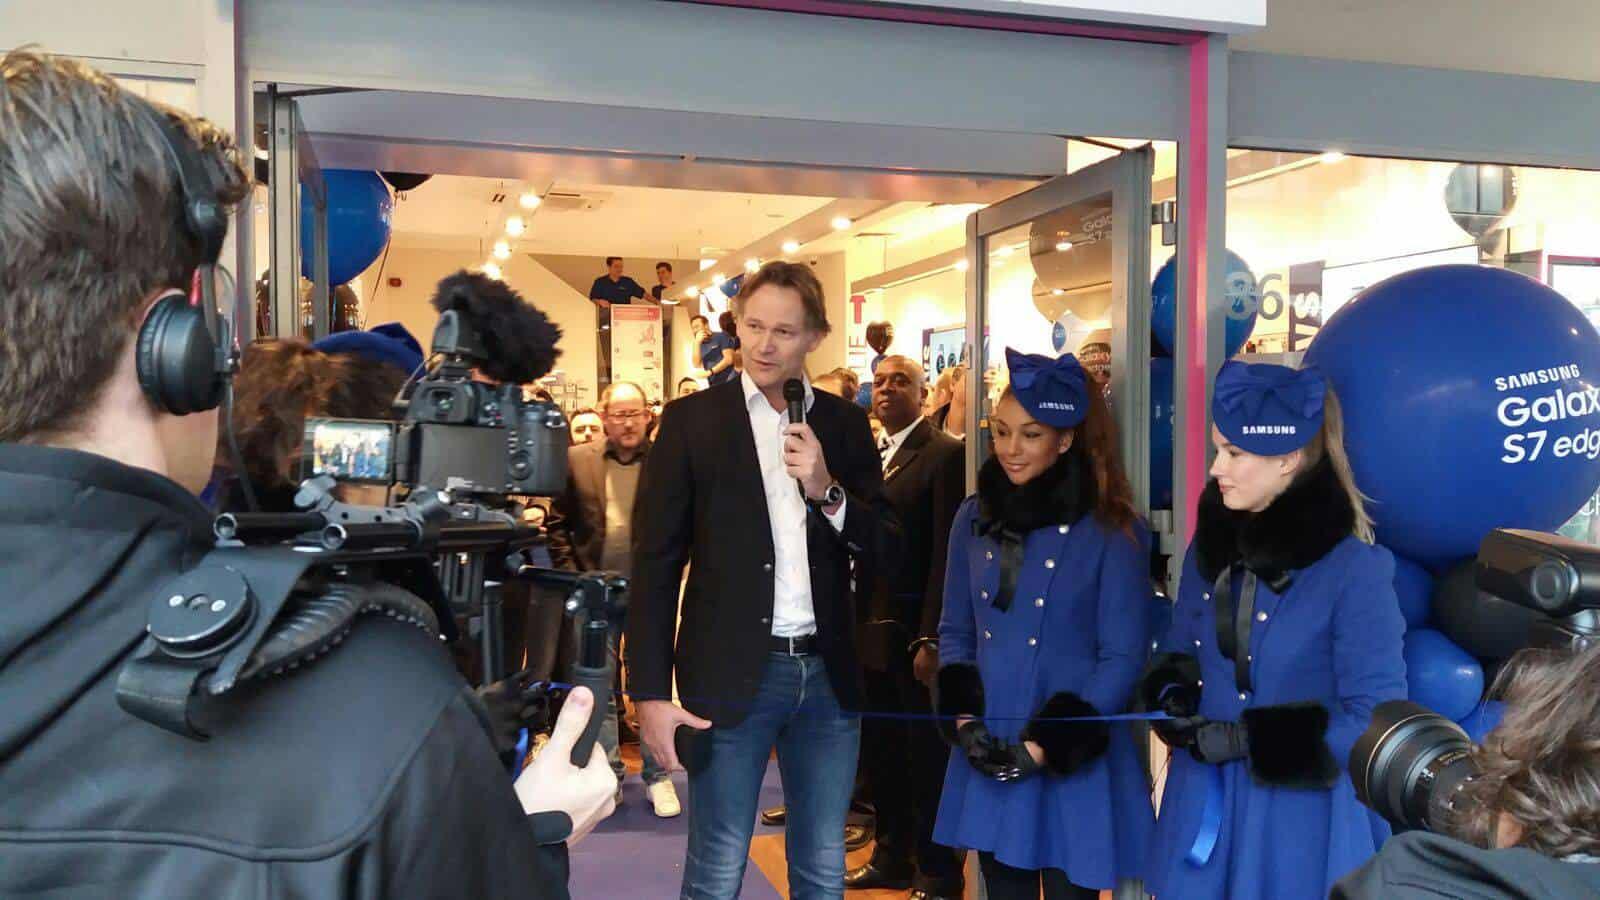 Galaxy S7 S7 Edge Netherlands launch 2